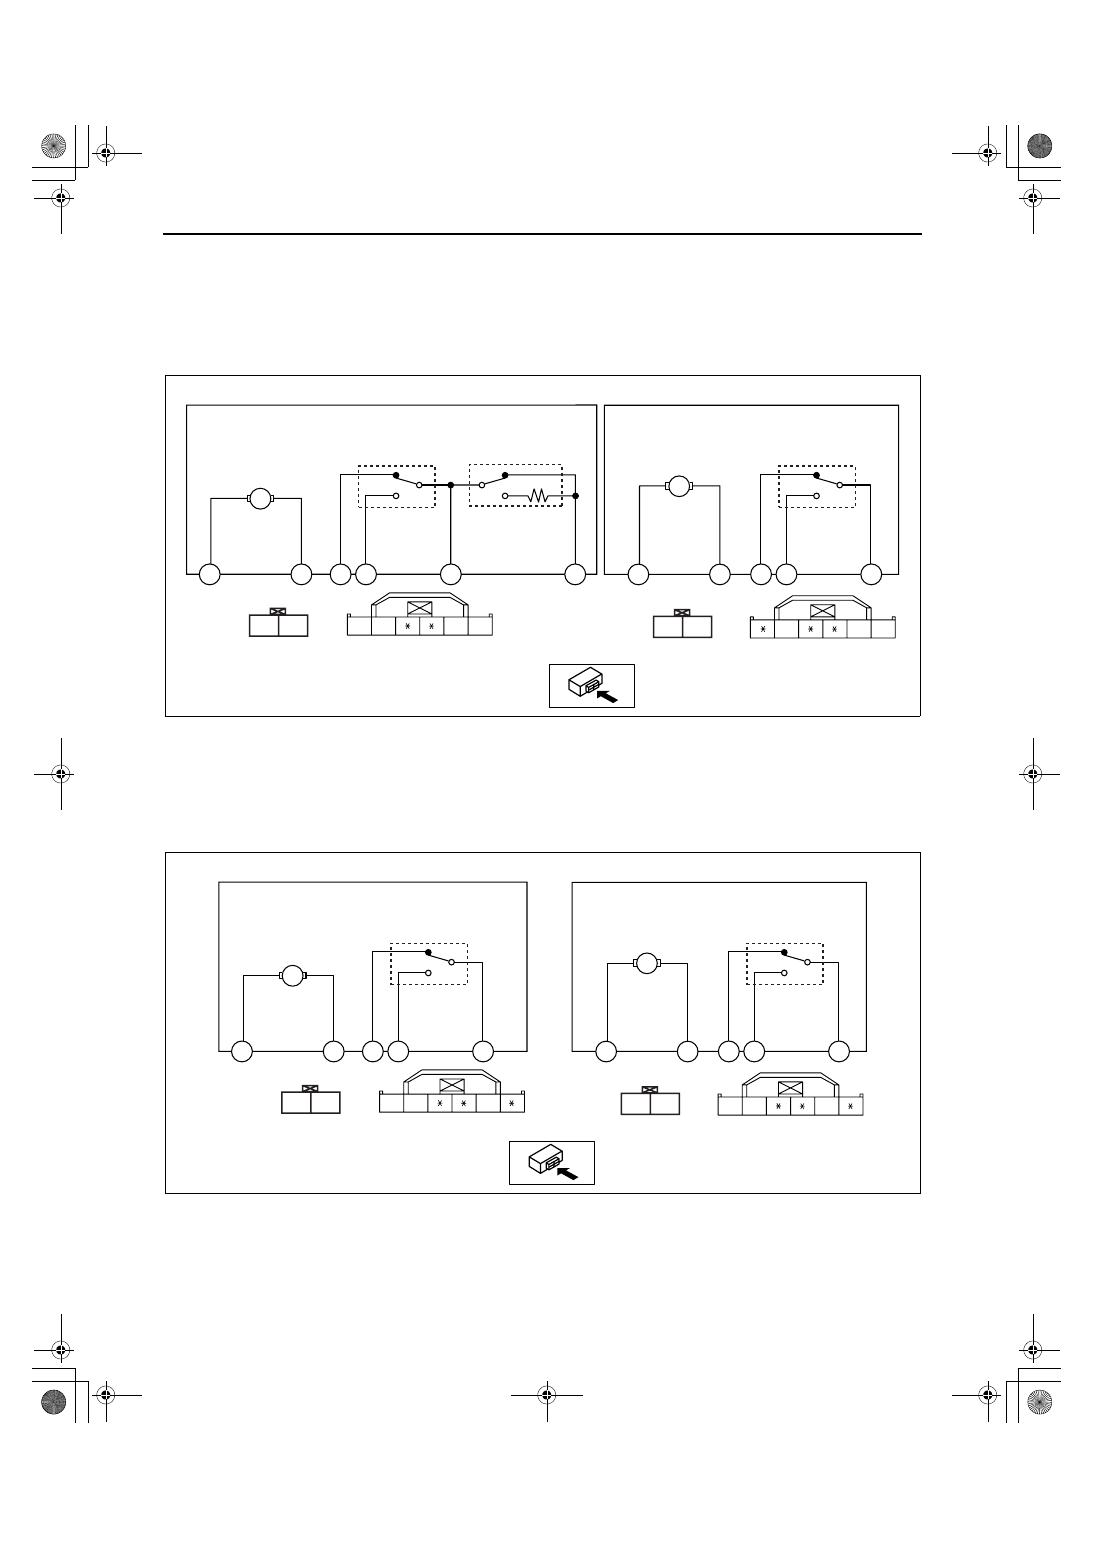 Mazda 3 Service Manual: Keyless Beeper Inspection